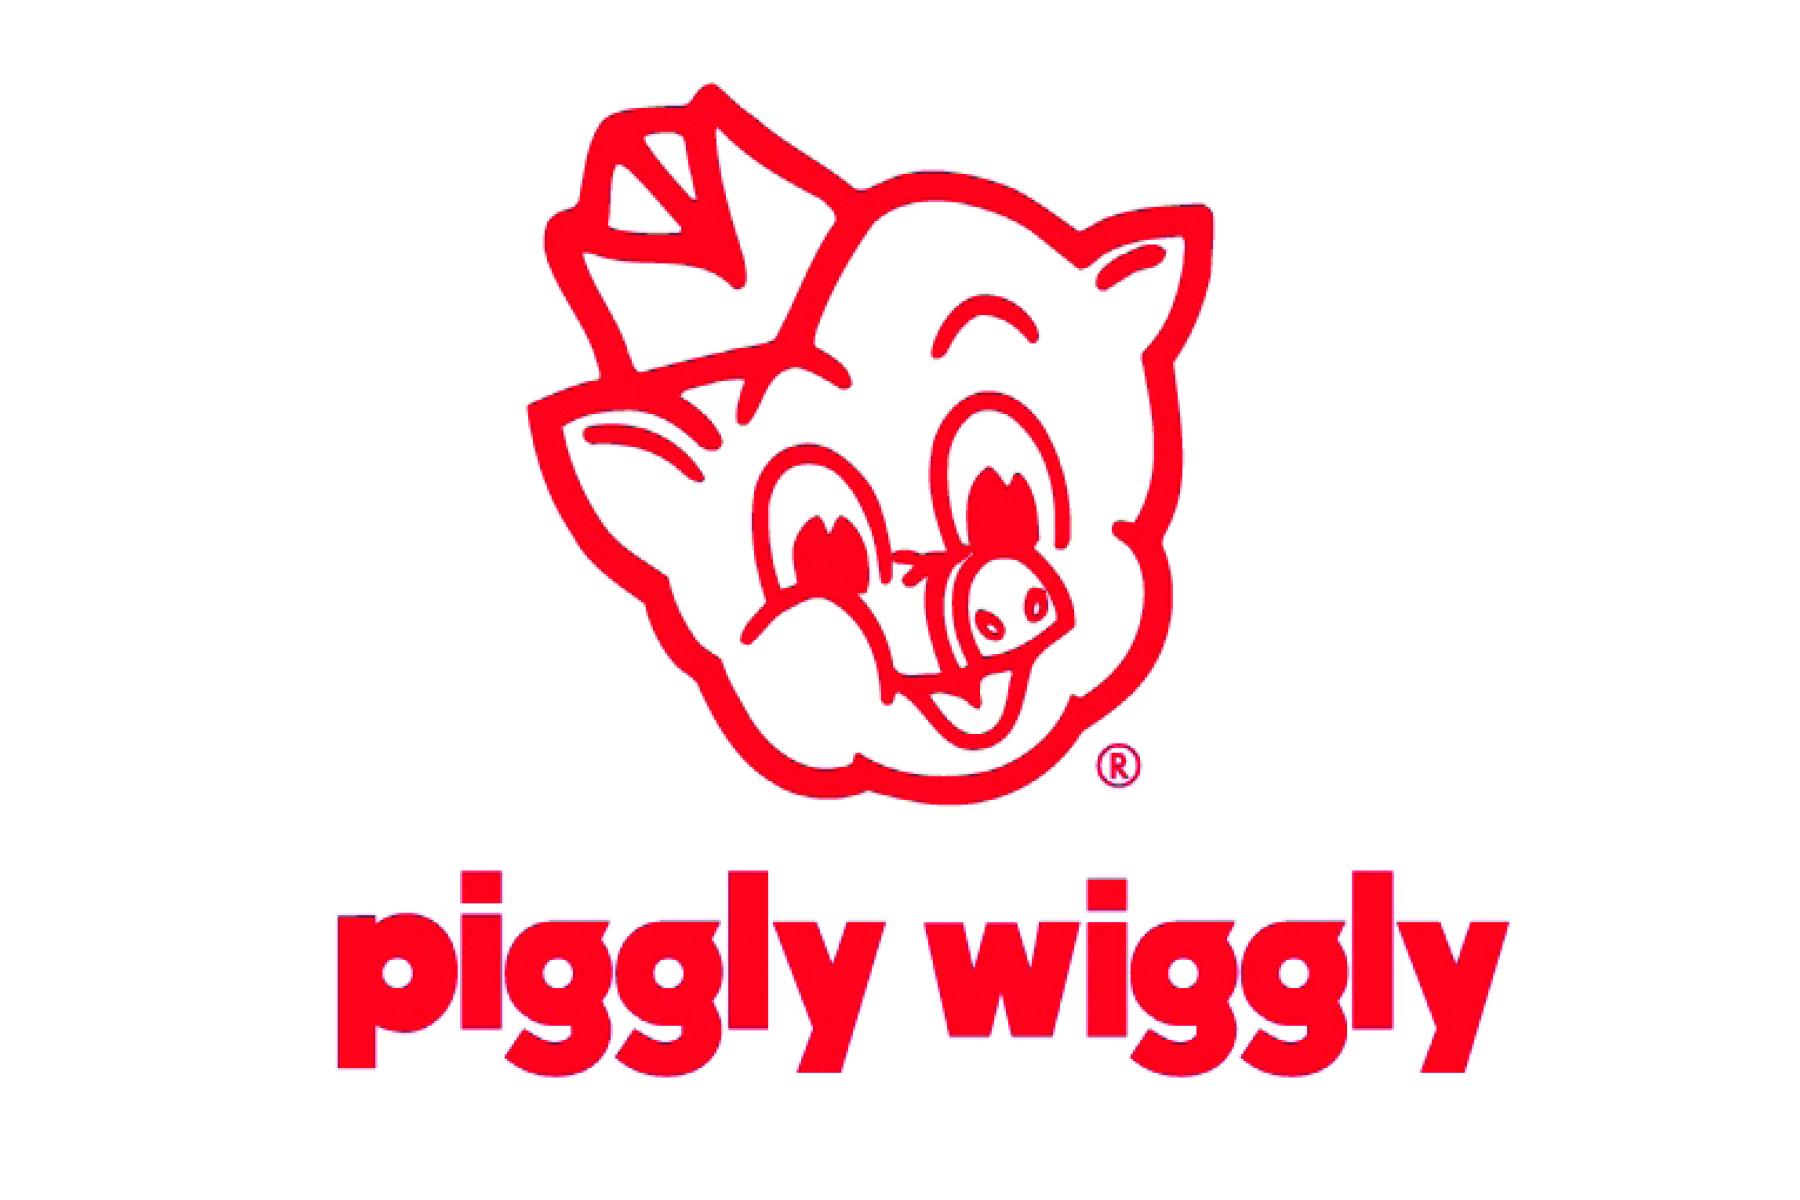 PIGGLY WIGGLY - GROCERY604 N McLewean StKinston, NC 28501(252) 523-5727